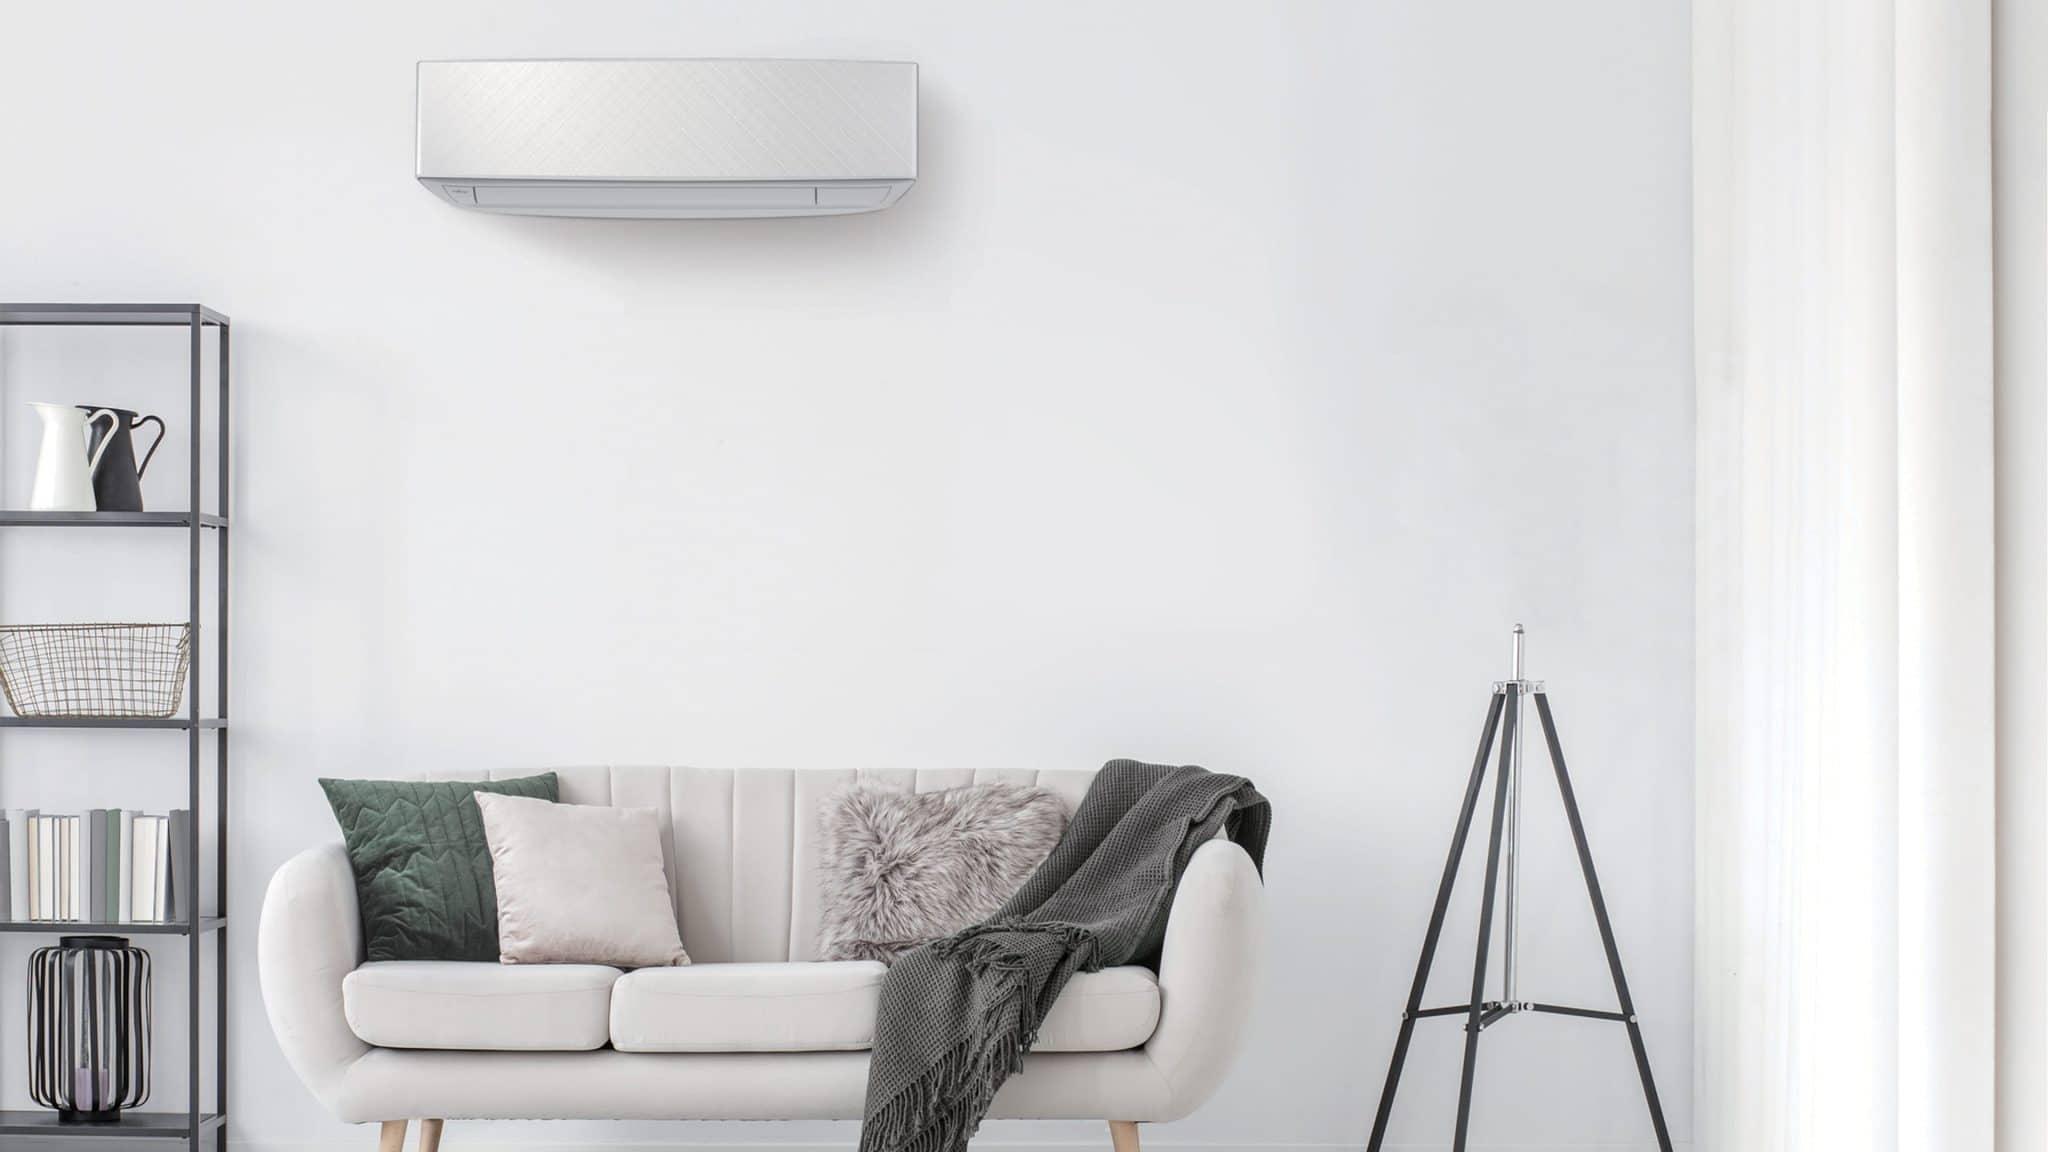 Green House Solutions zonnepanelen batterijopslag laadpalen airconditioning fujitsu 000008